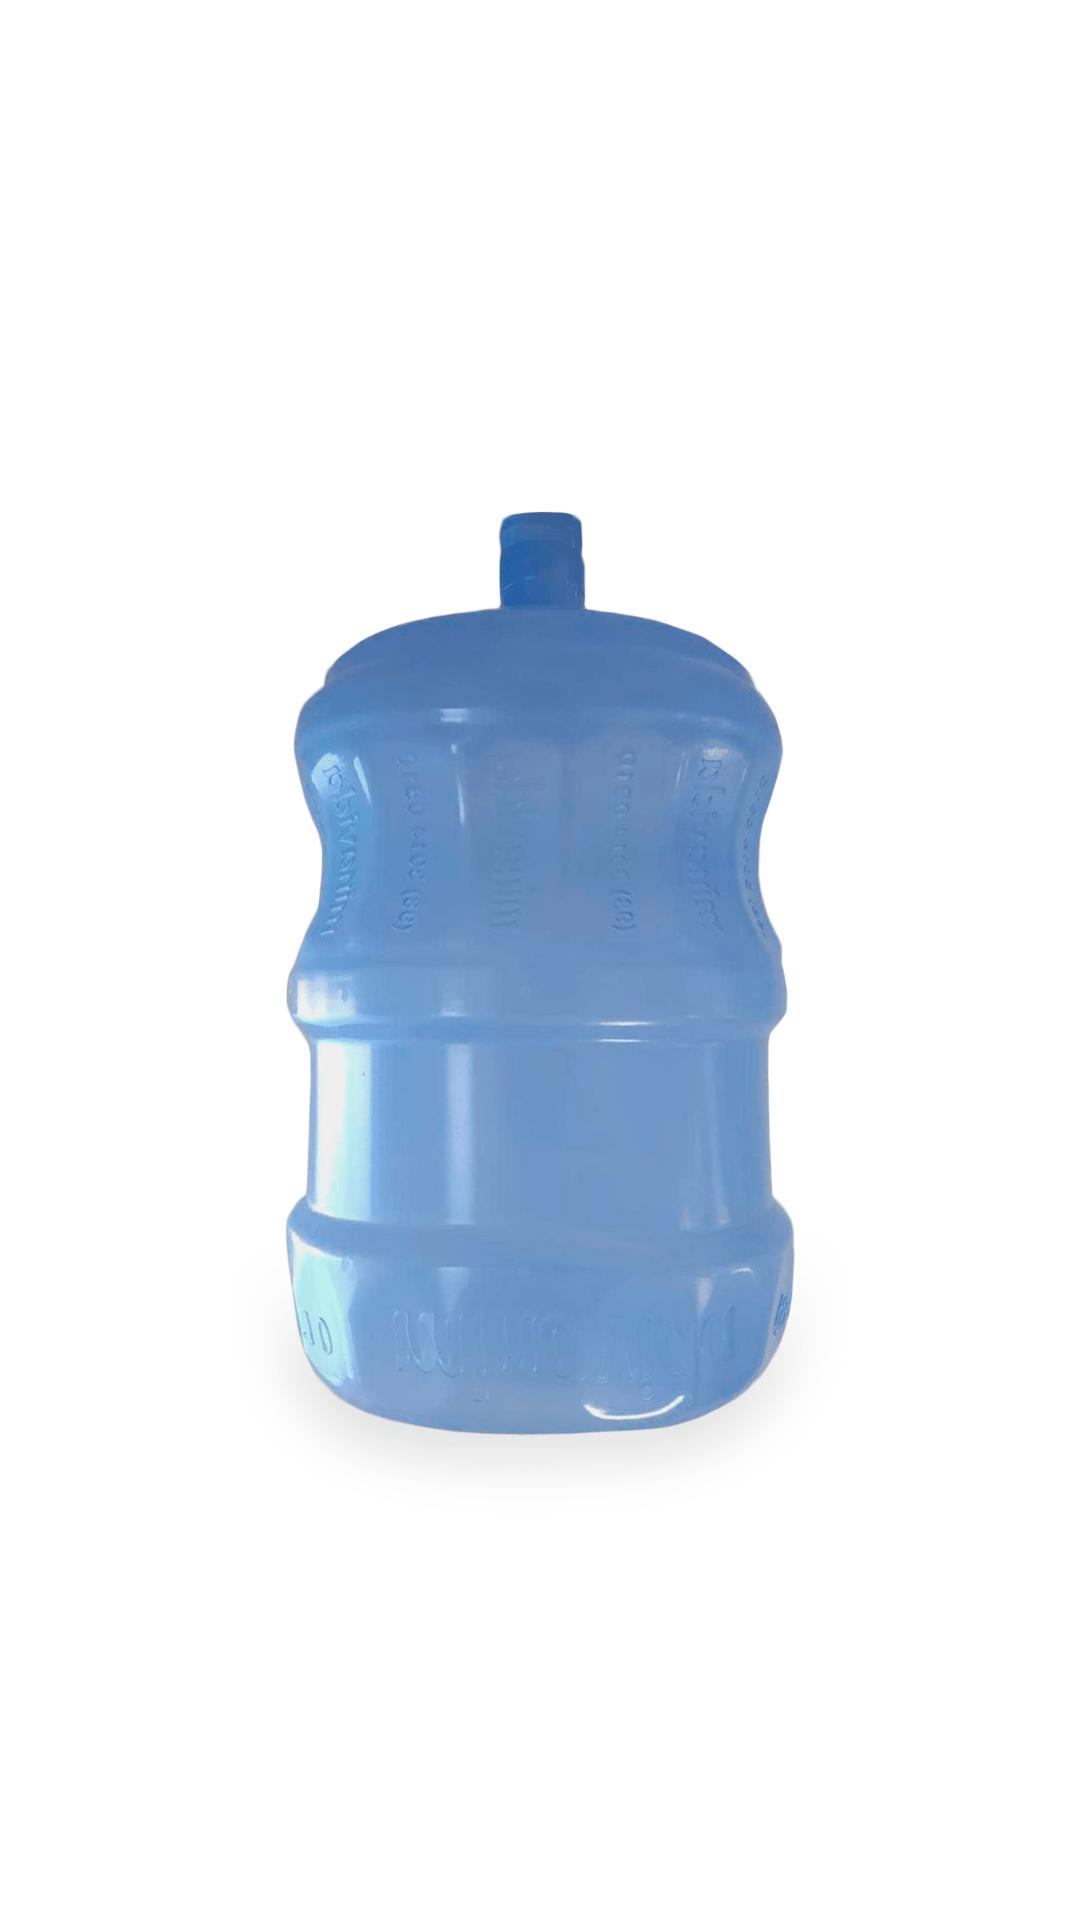 Galao Especial para armazenamento de água